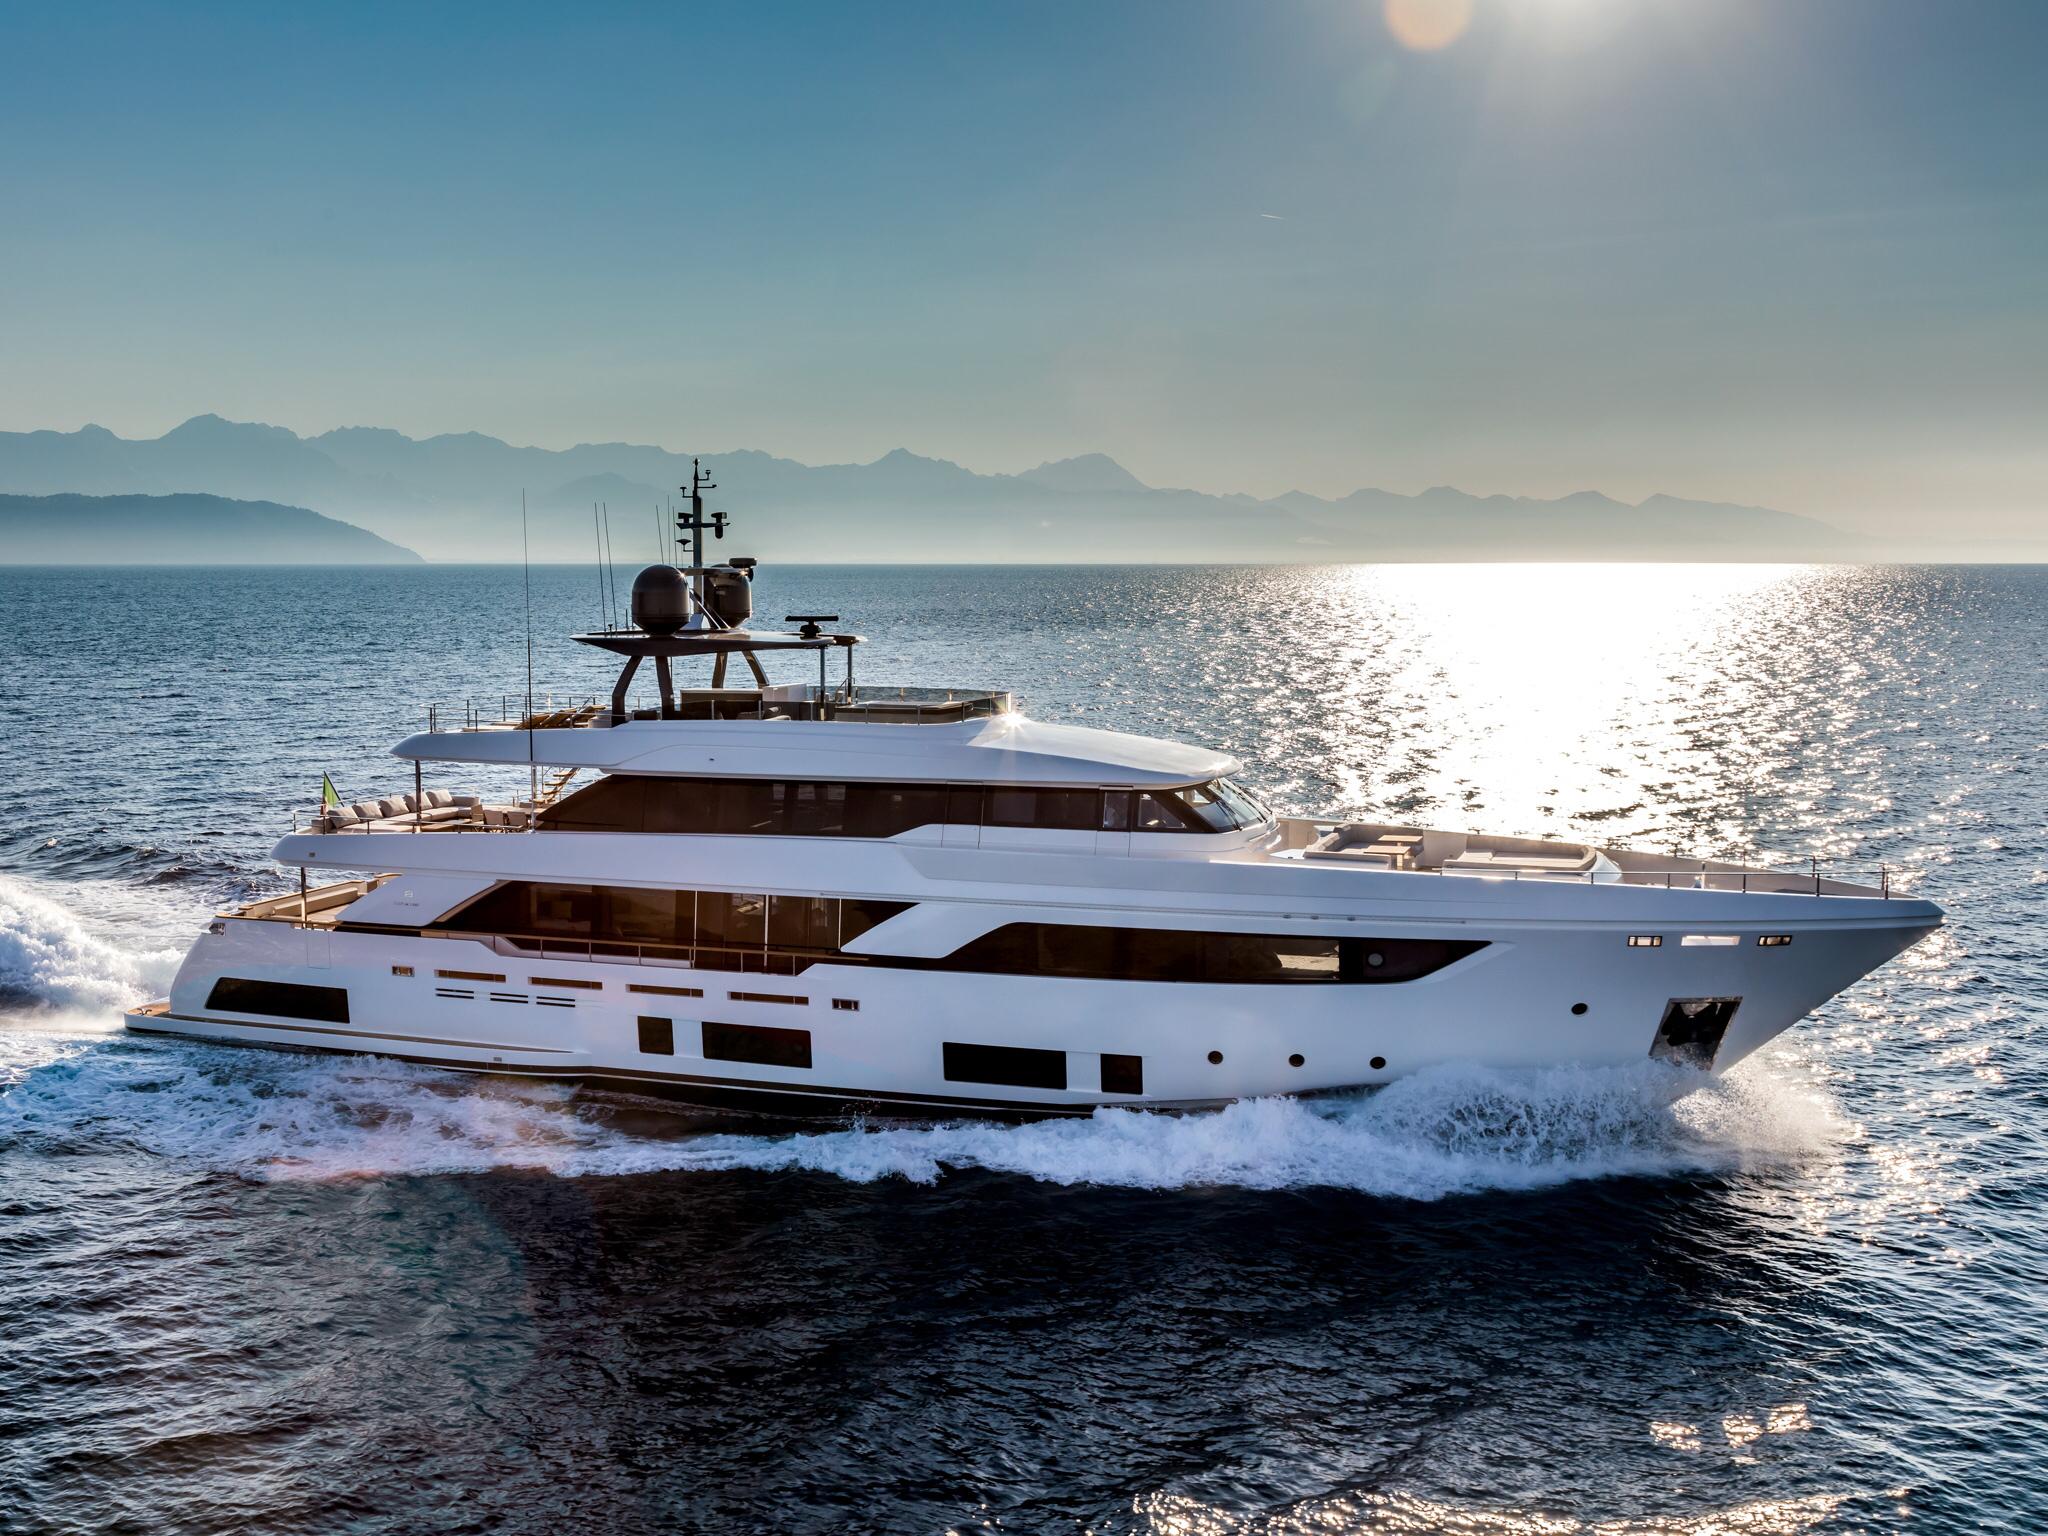 ferretti yachts ferretti group custom line yachts custom line navetta 37 JMA Yachting Port Fréjus Var vente location neuf occasi